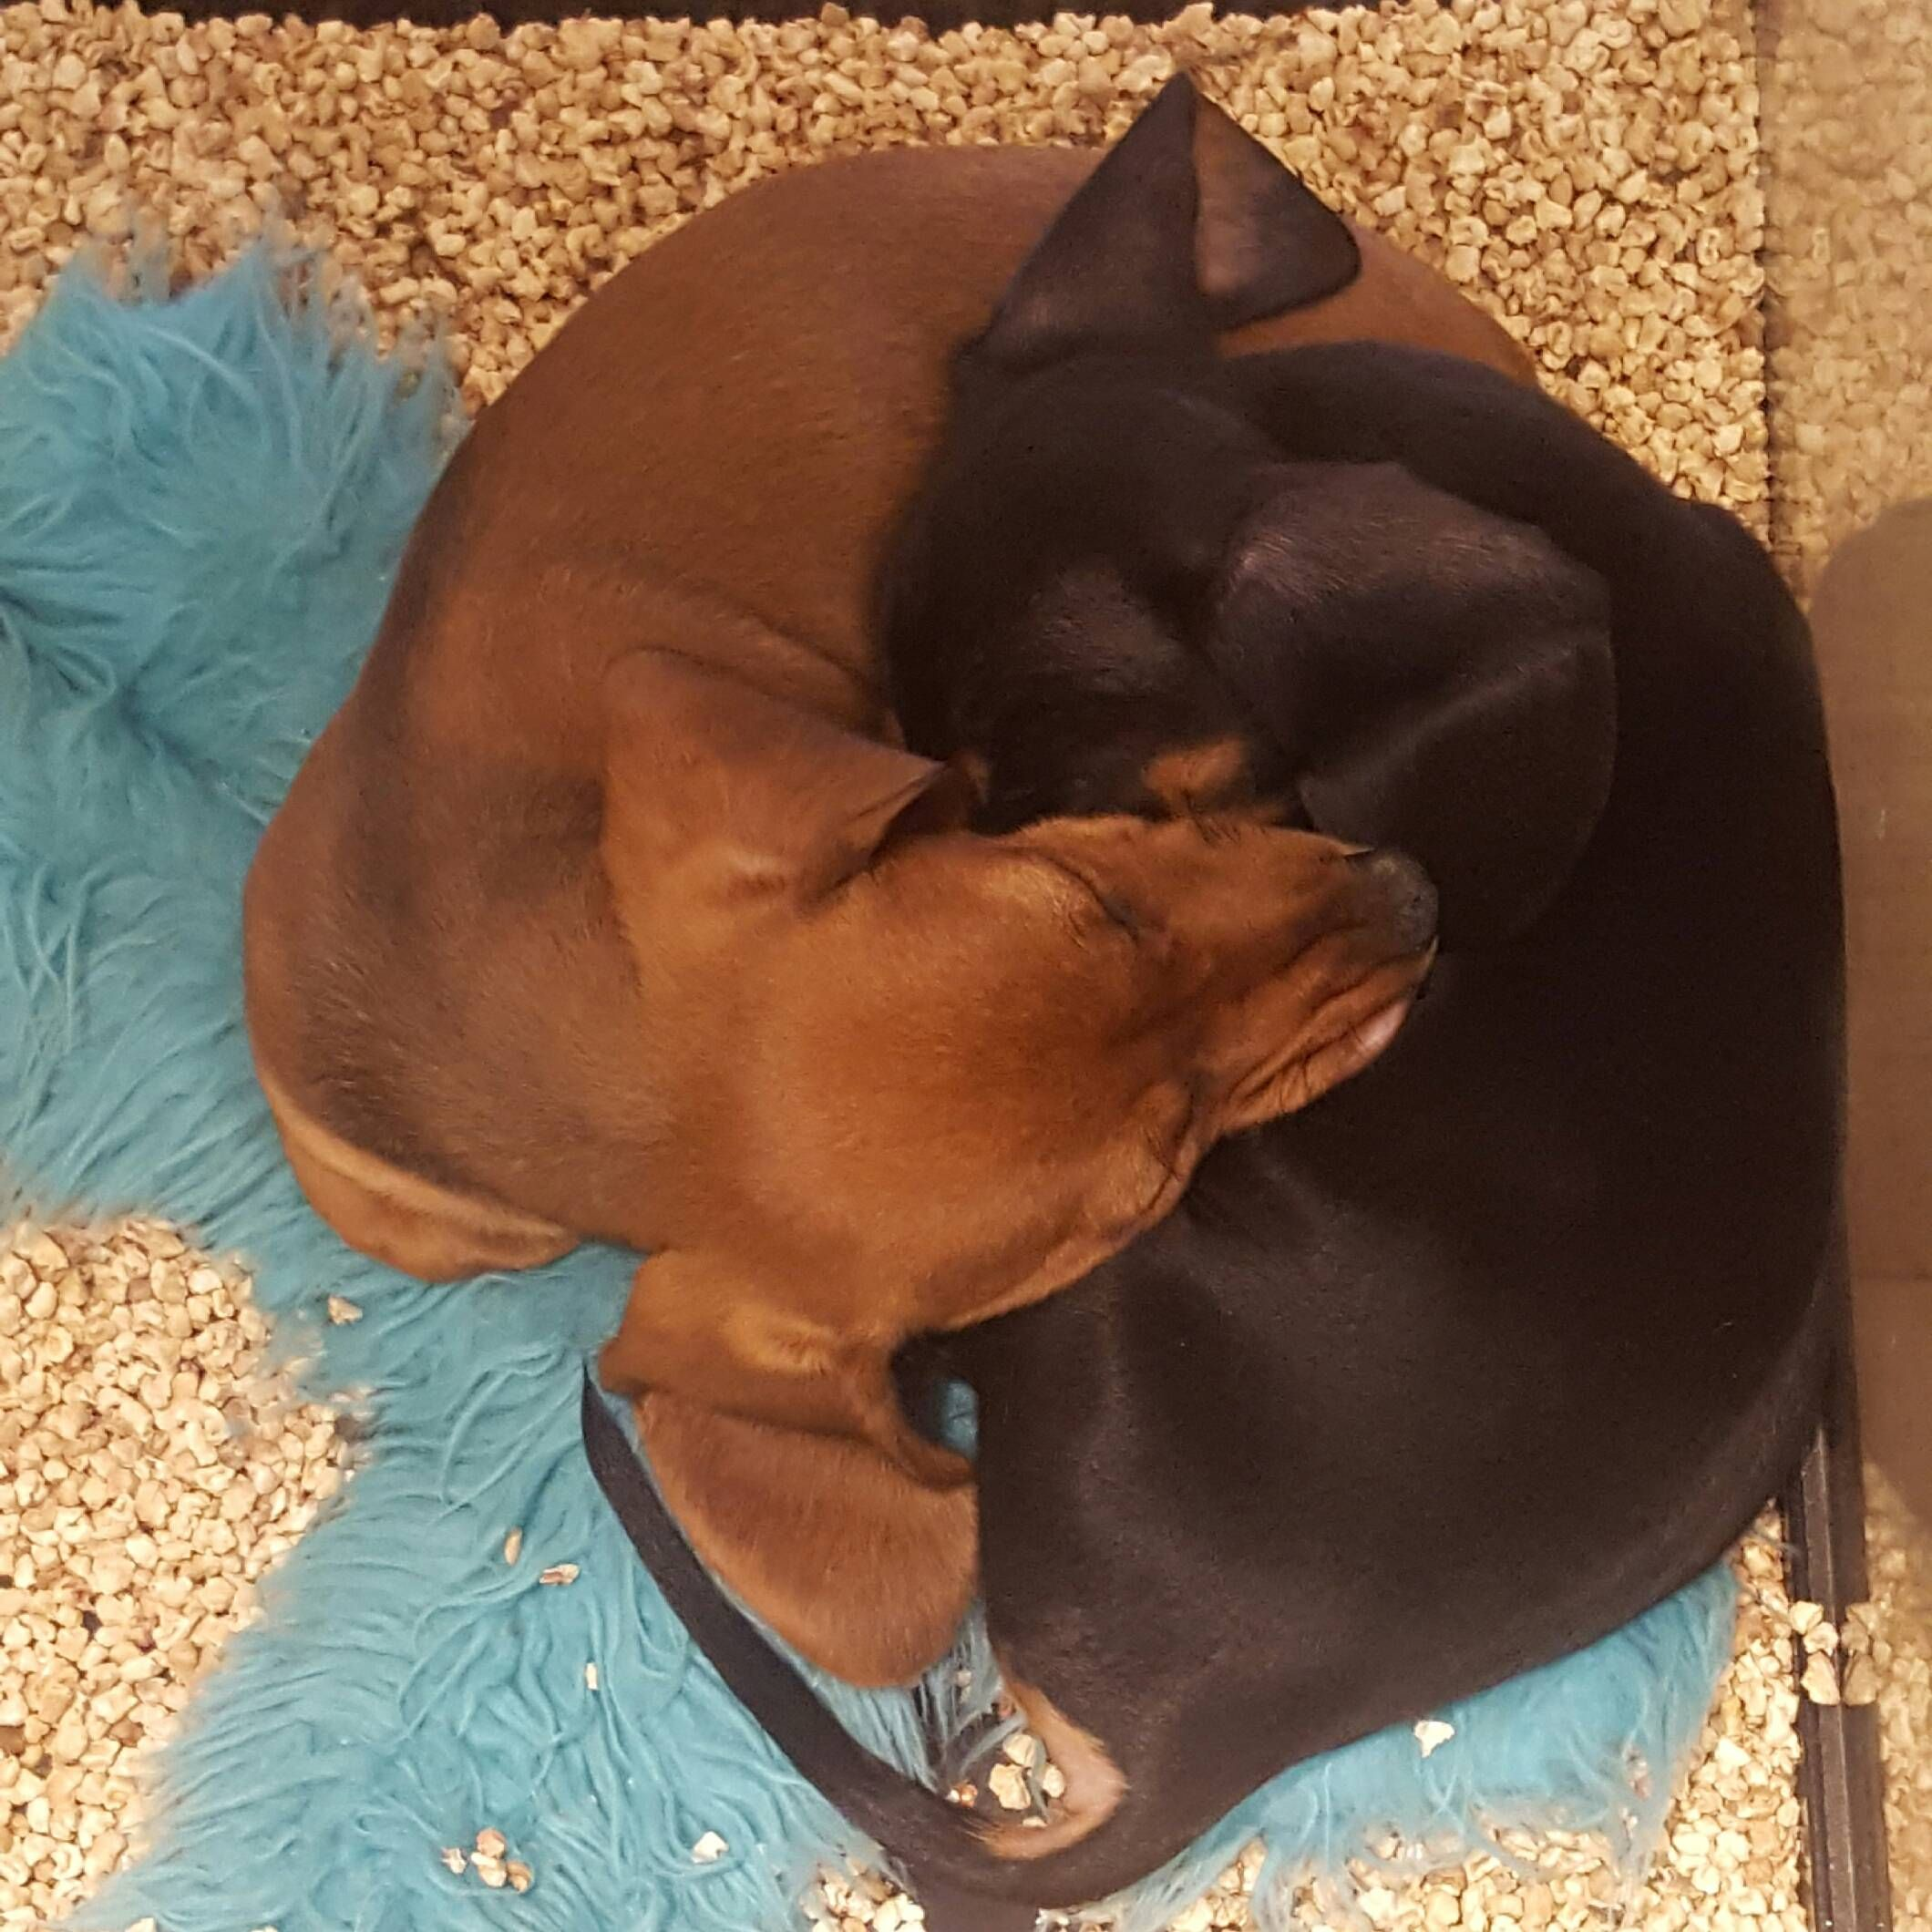 Yin and yang cuddle pups at a pet store http://ift.tt/2i4CbG8